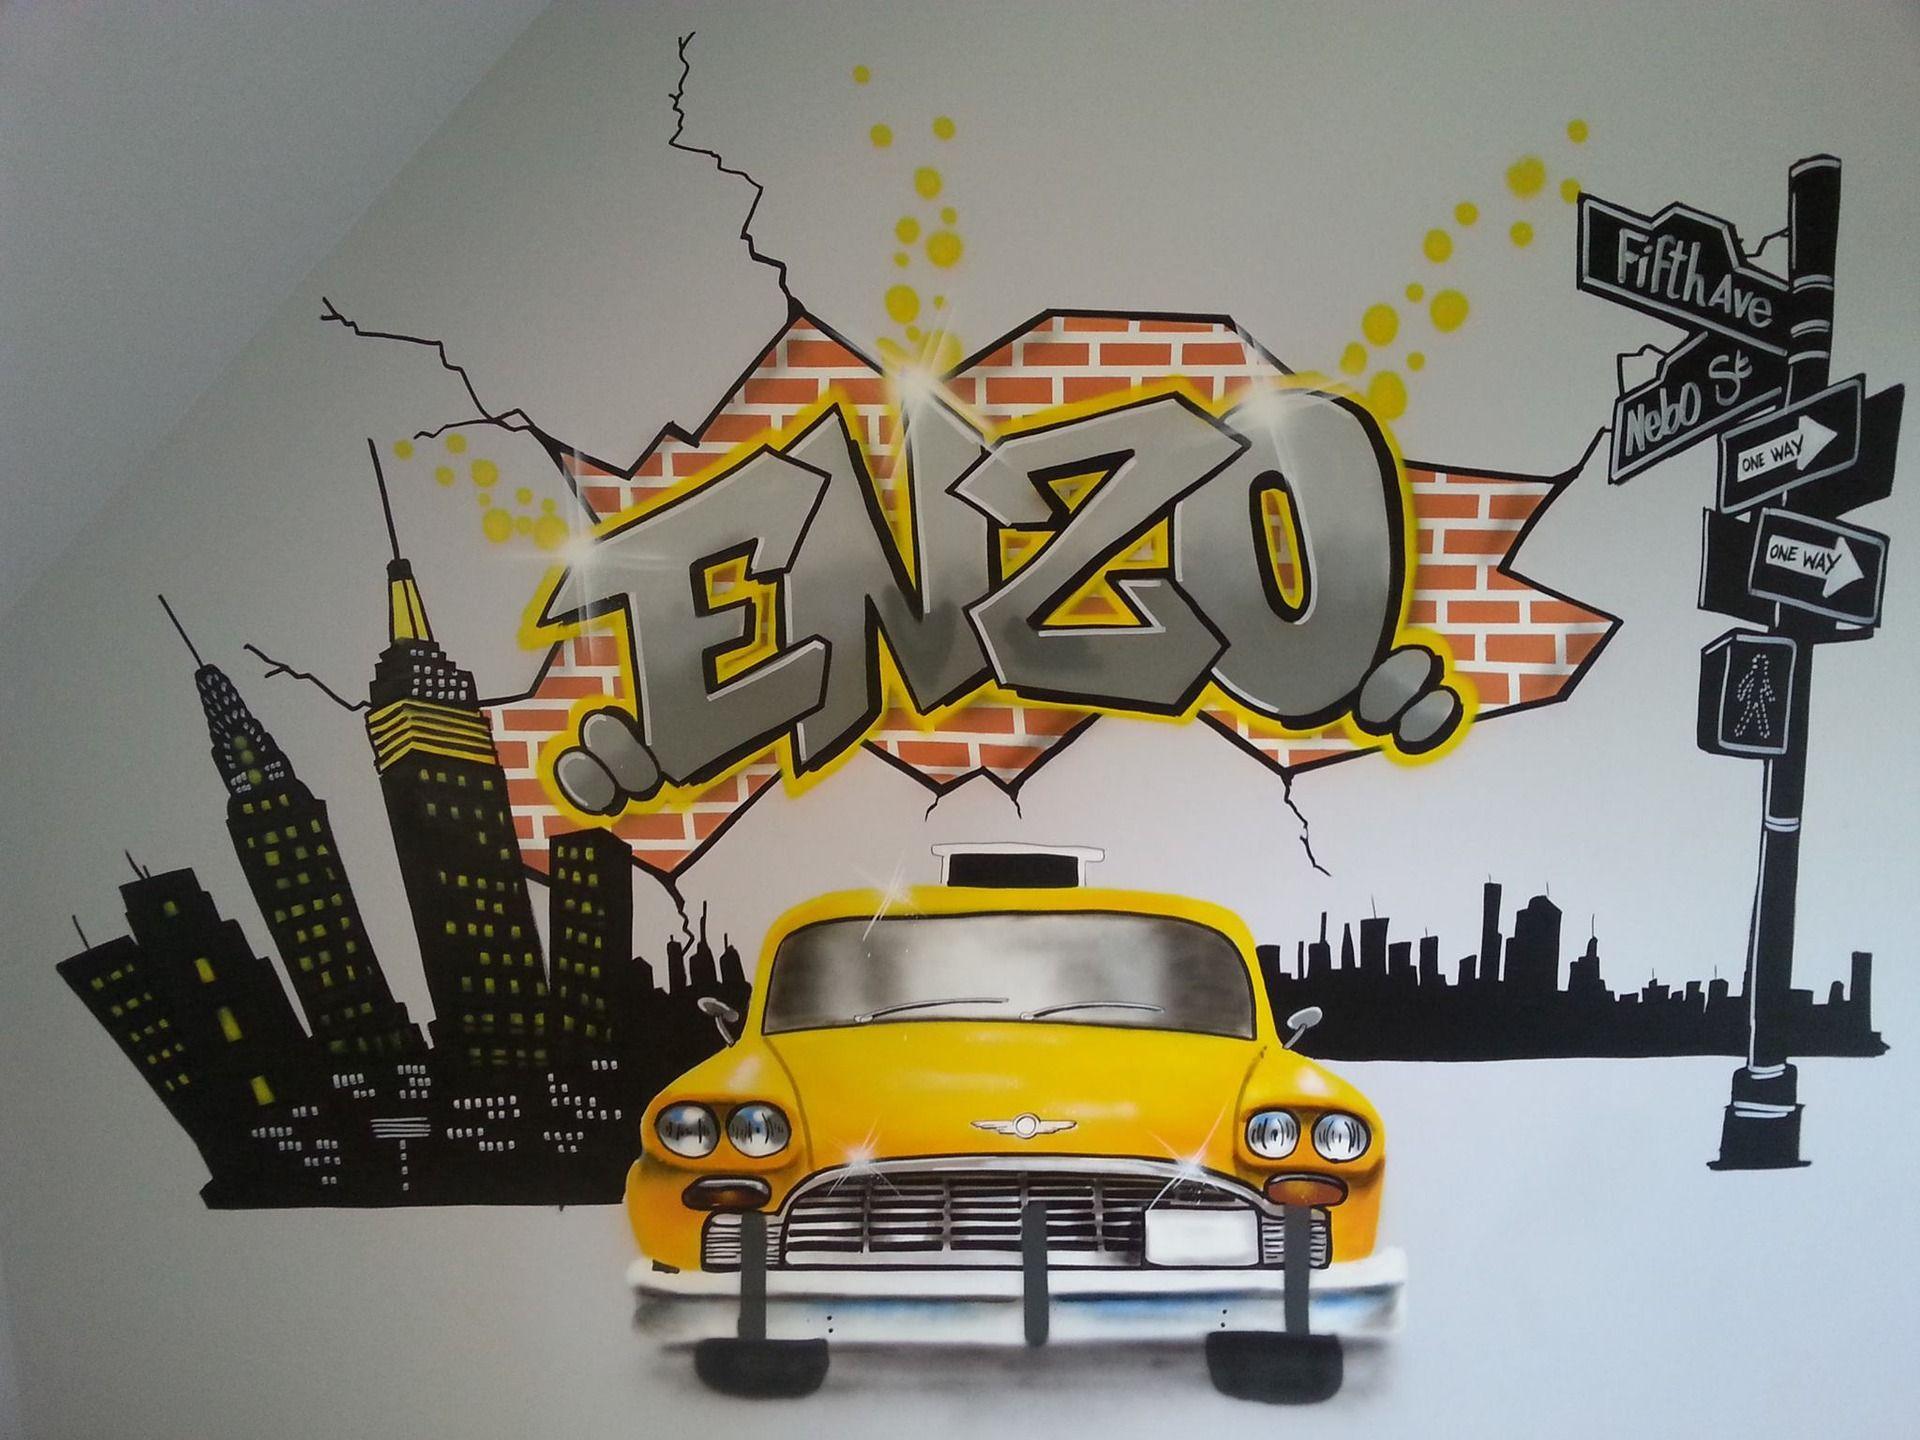 Afficher L Image D Origine Graffiti Prenom Pinterest Art Walls